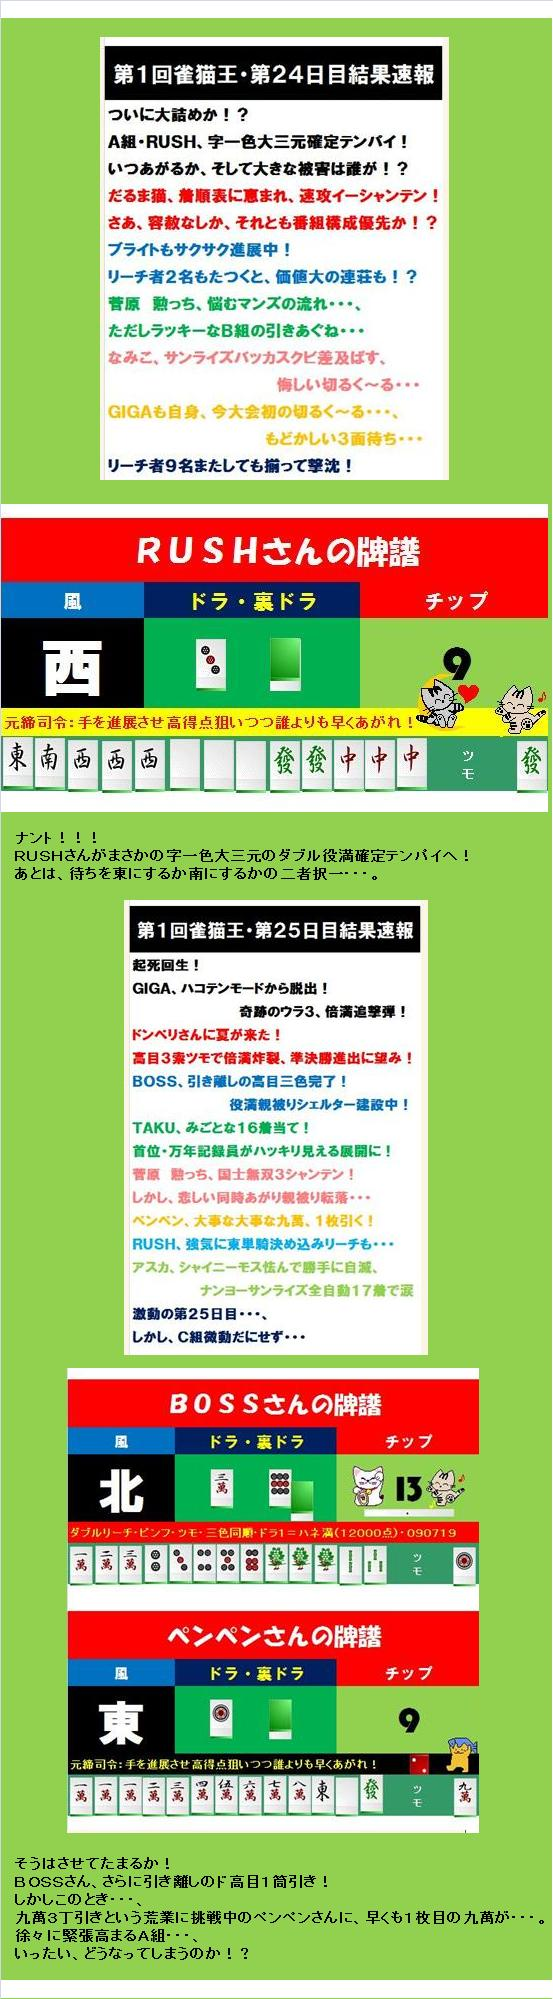 20100226・A組回顧12.jpg